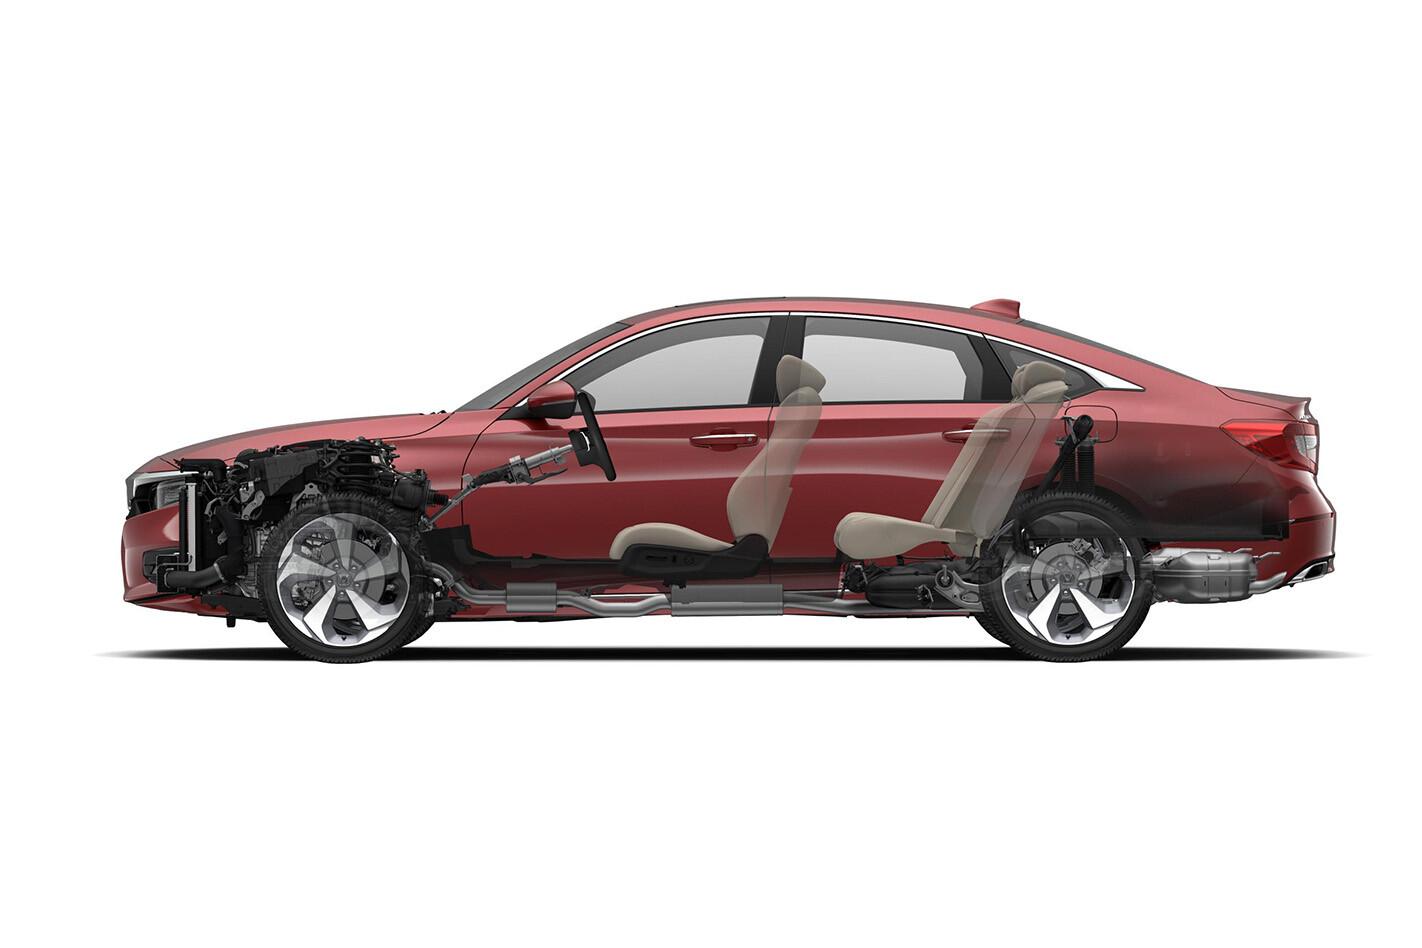 2020 Honda Accord cutaway